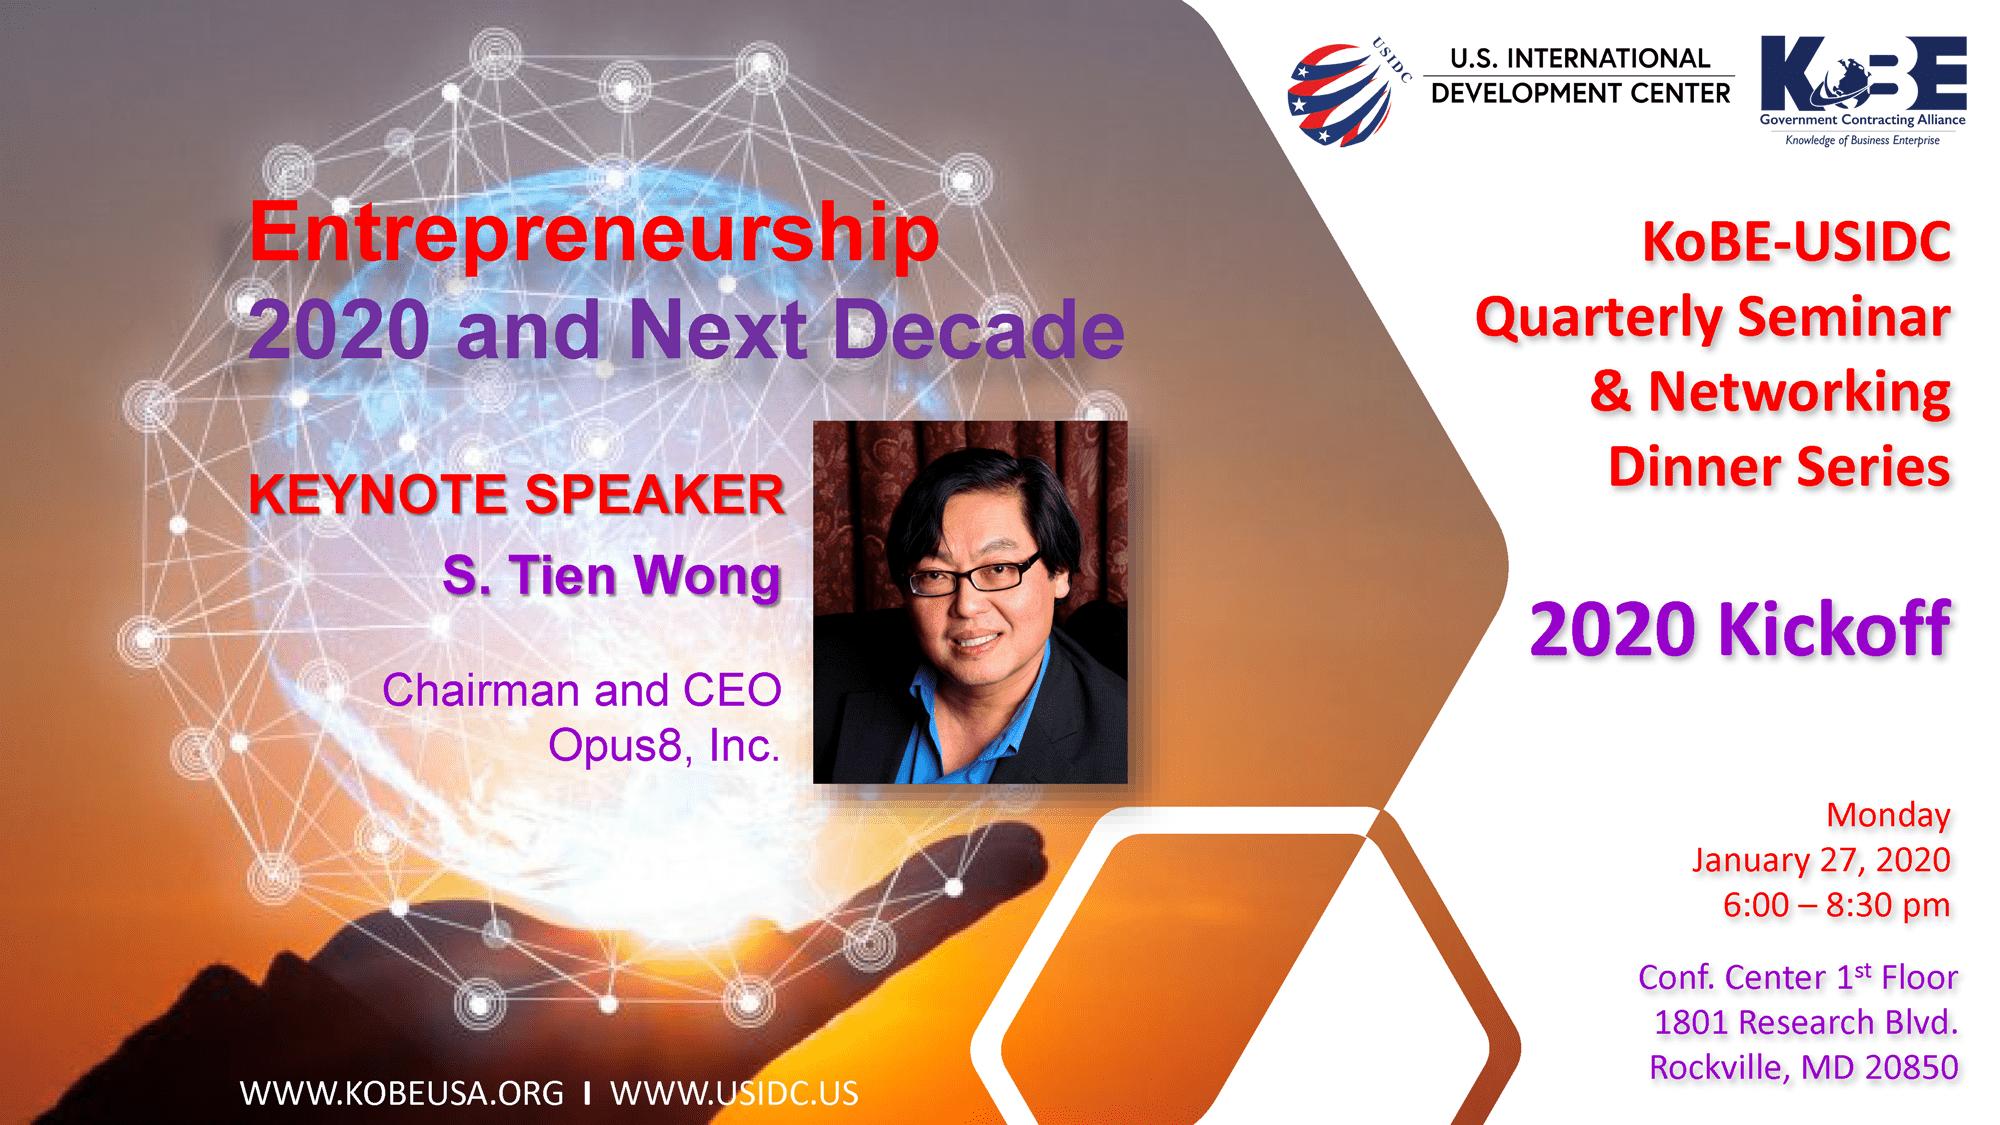 2020 KoBE/USIDC 1st Quarterly Biz Seminar: Entrepreneurship 2020 and Next Decade